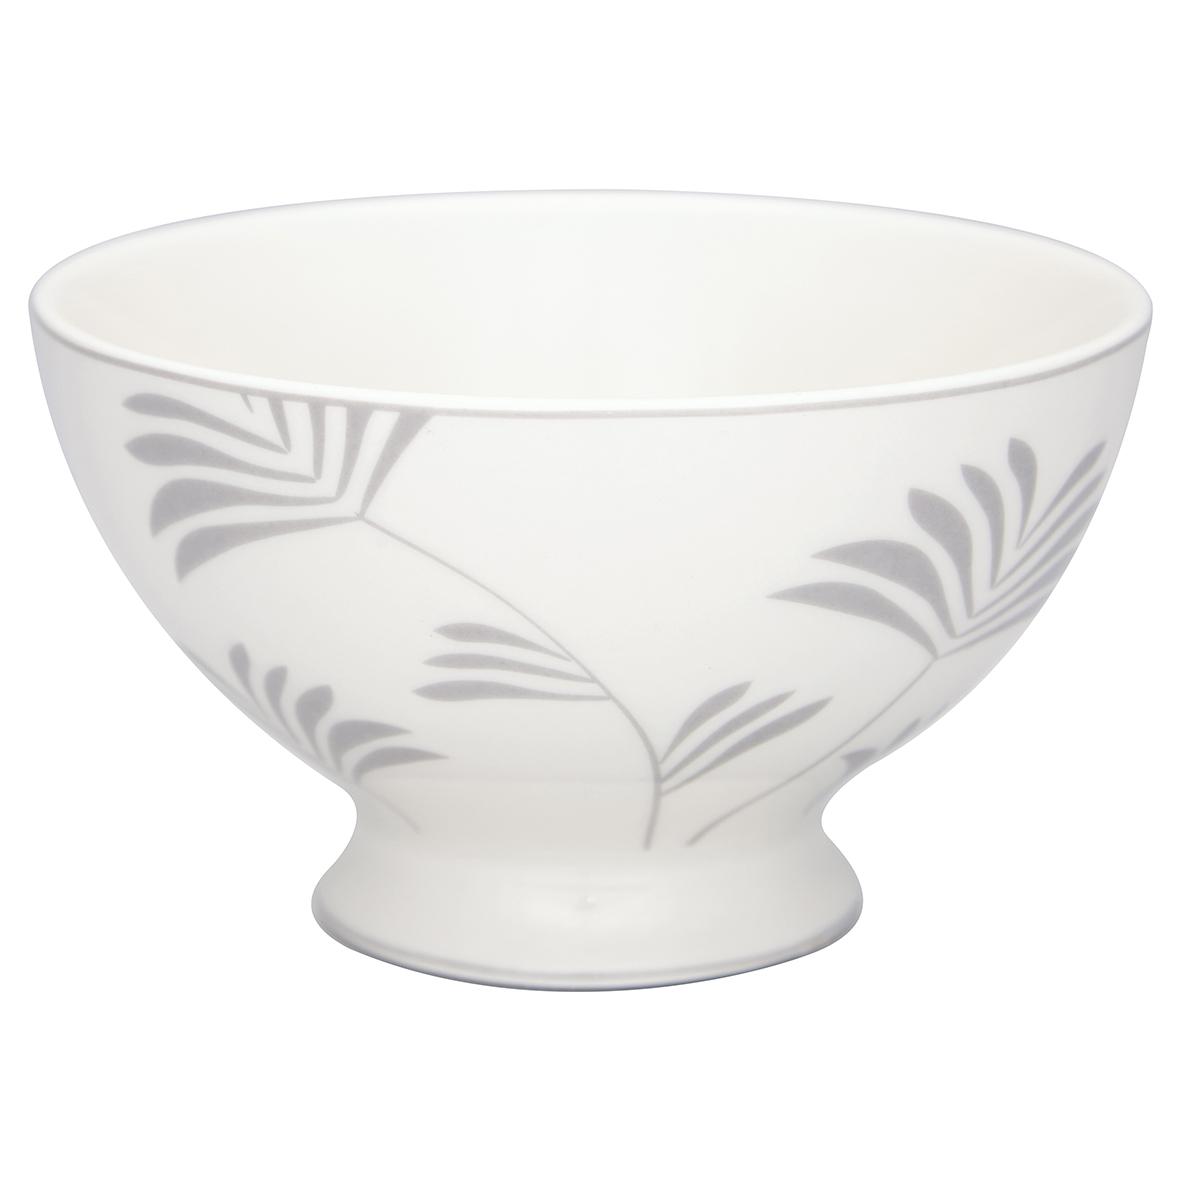 Greengate Schüssel Maxime white Soup Bowl